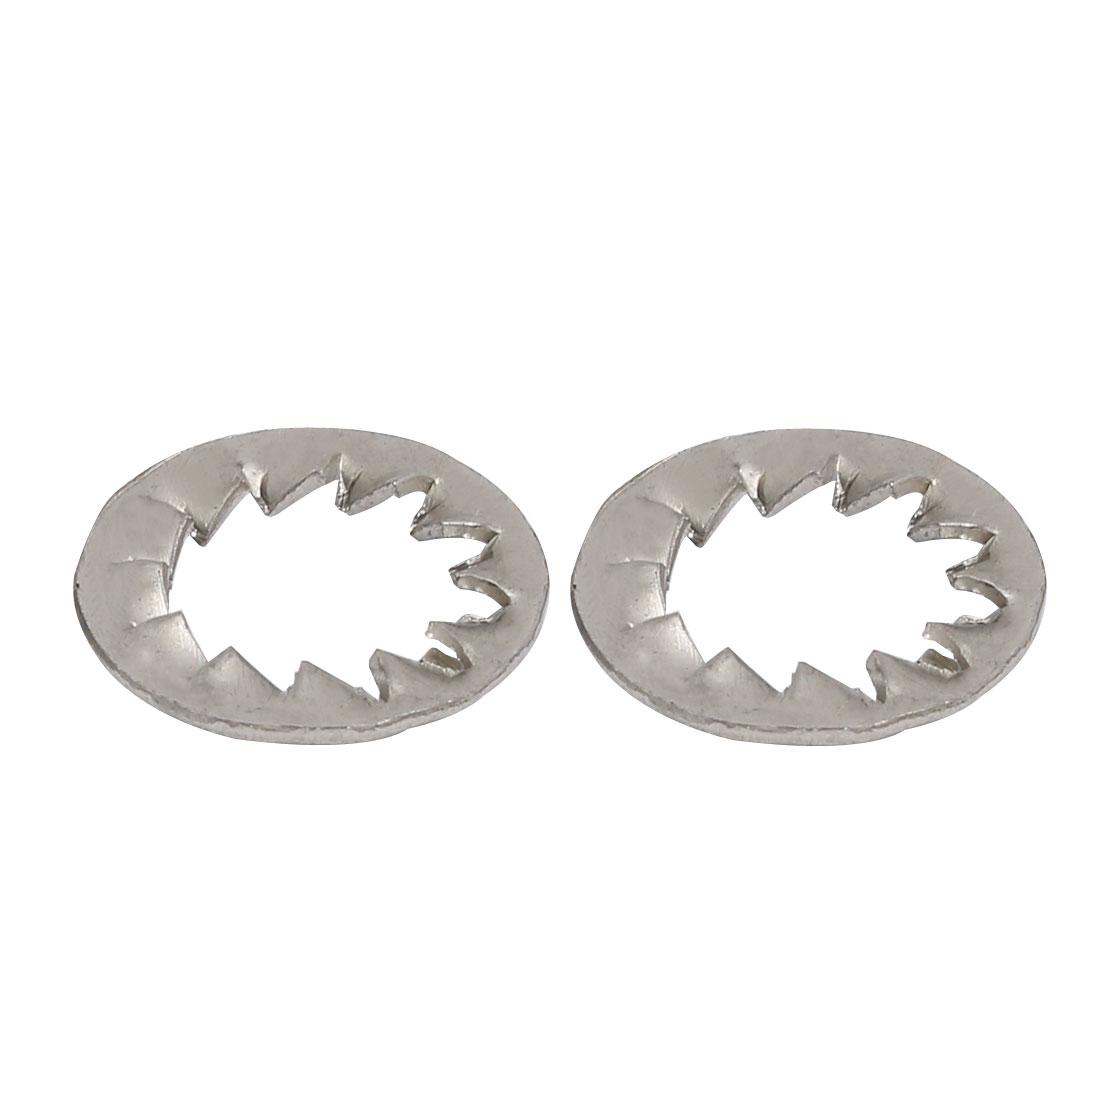 10mm Inner Dia 304 Stainless Steel Internal Serrated Lock Washers Gasket 50pcs - image 1 de 2